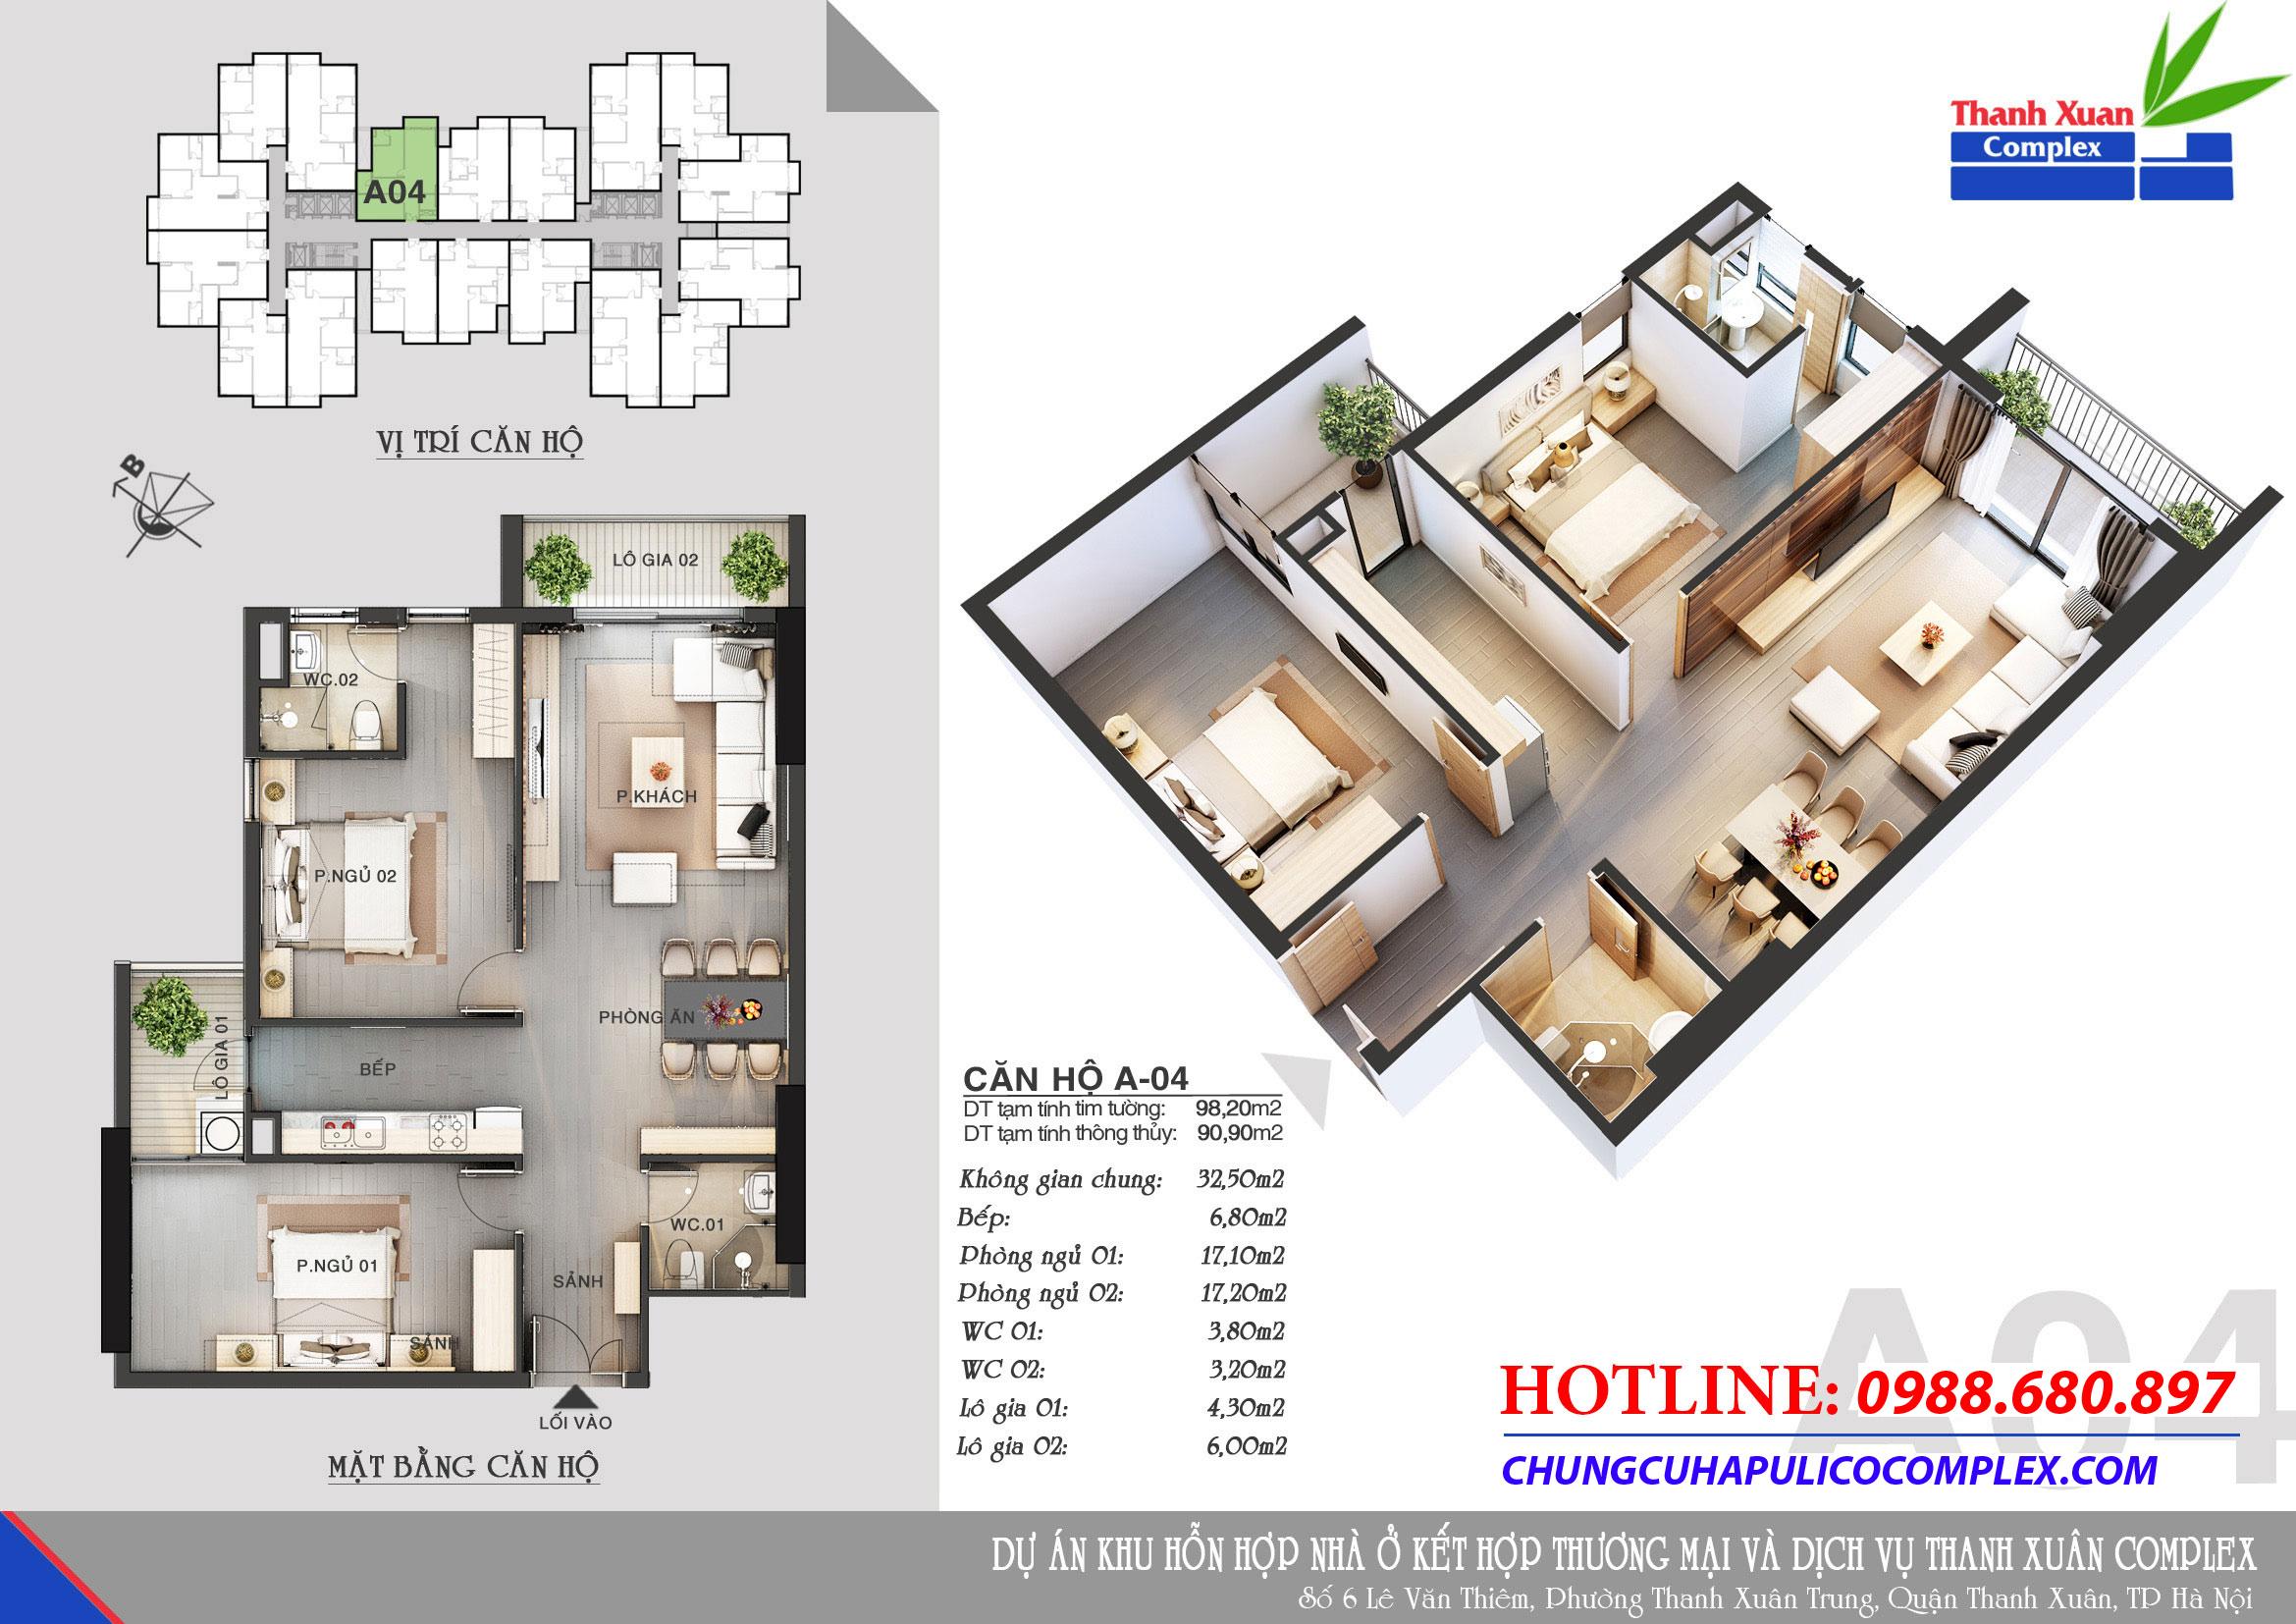 HSB_Thanhxuan-complex_CH-A04_suachotT42016-copy